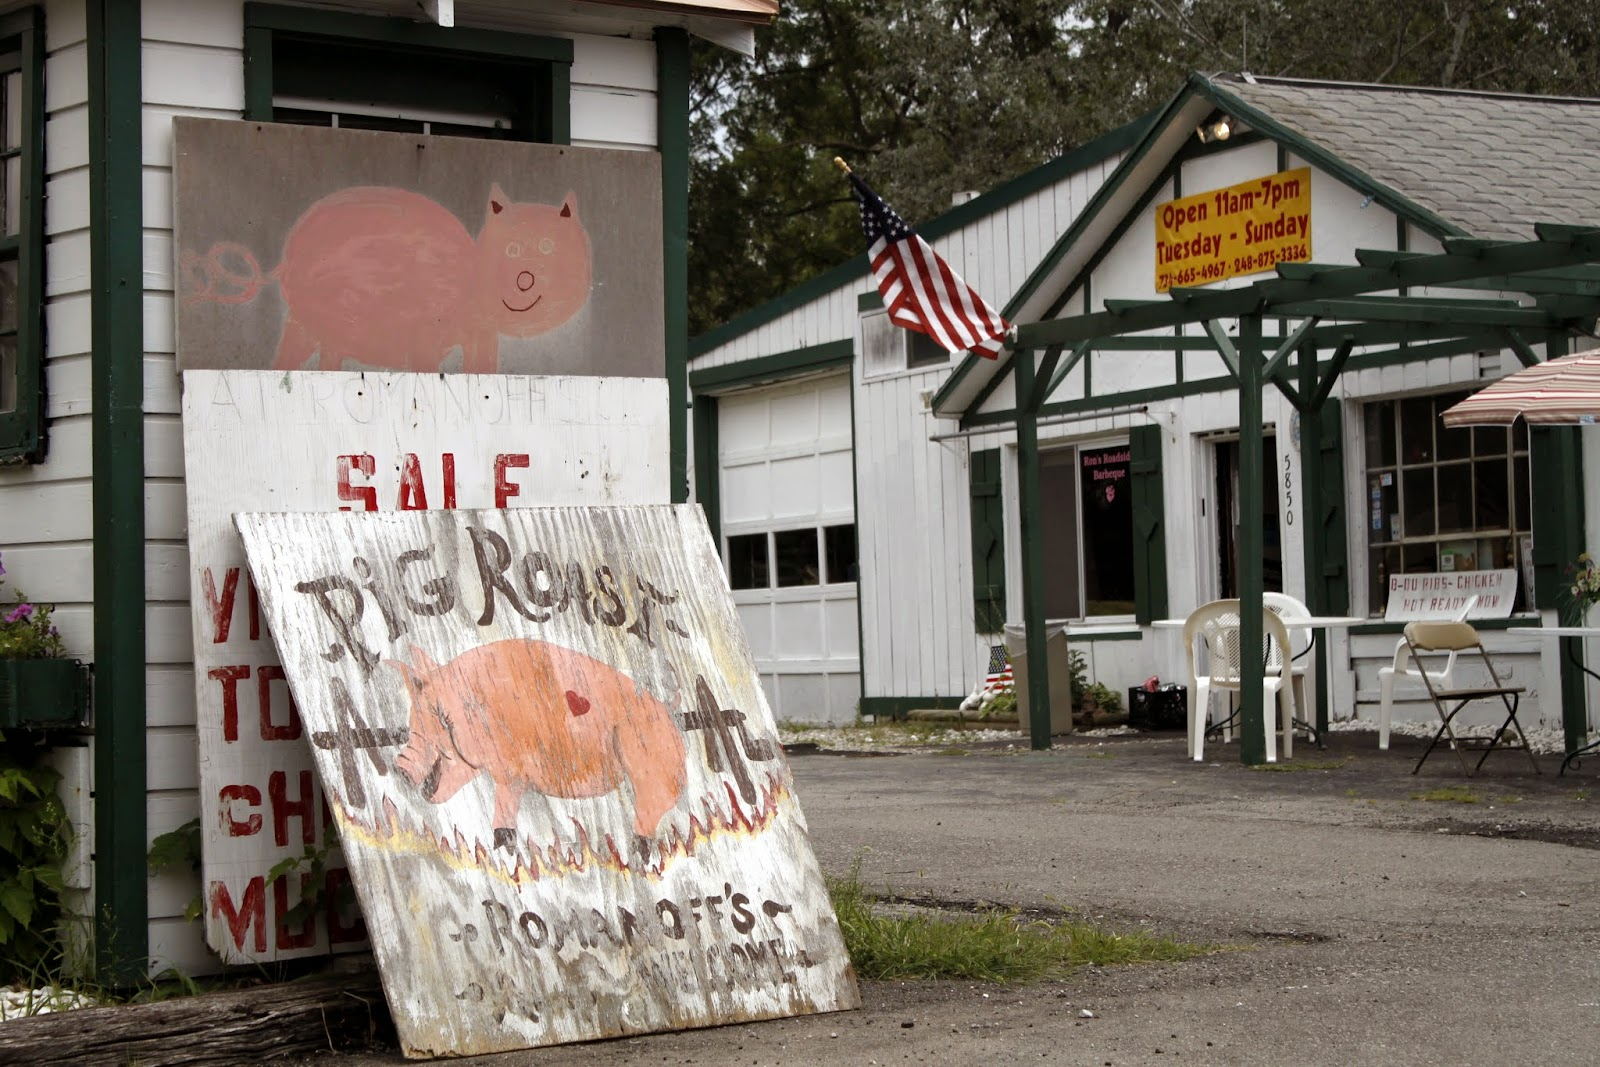 Michigan Cottage Food Law